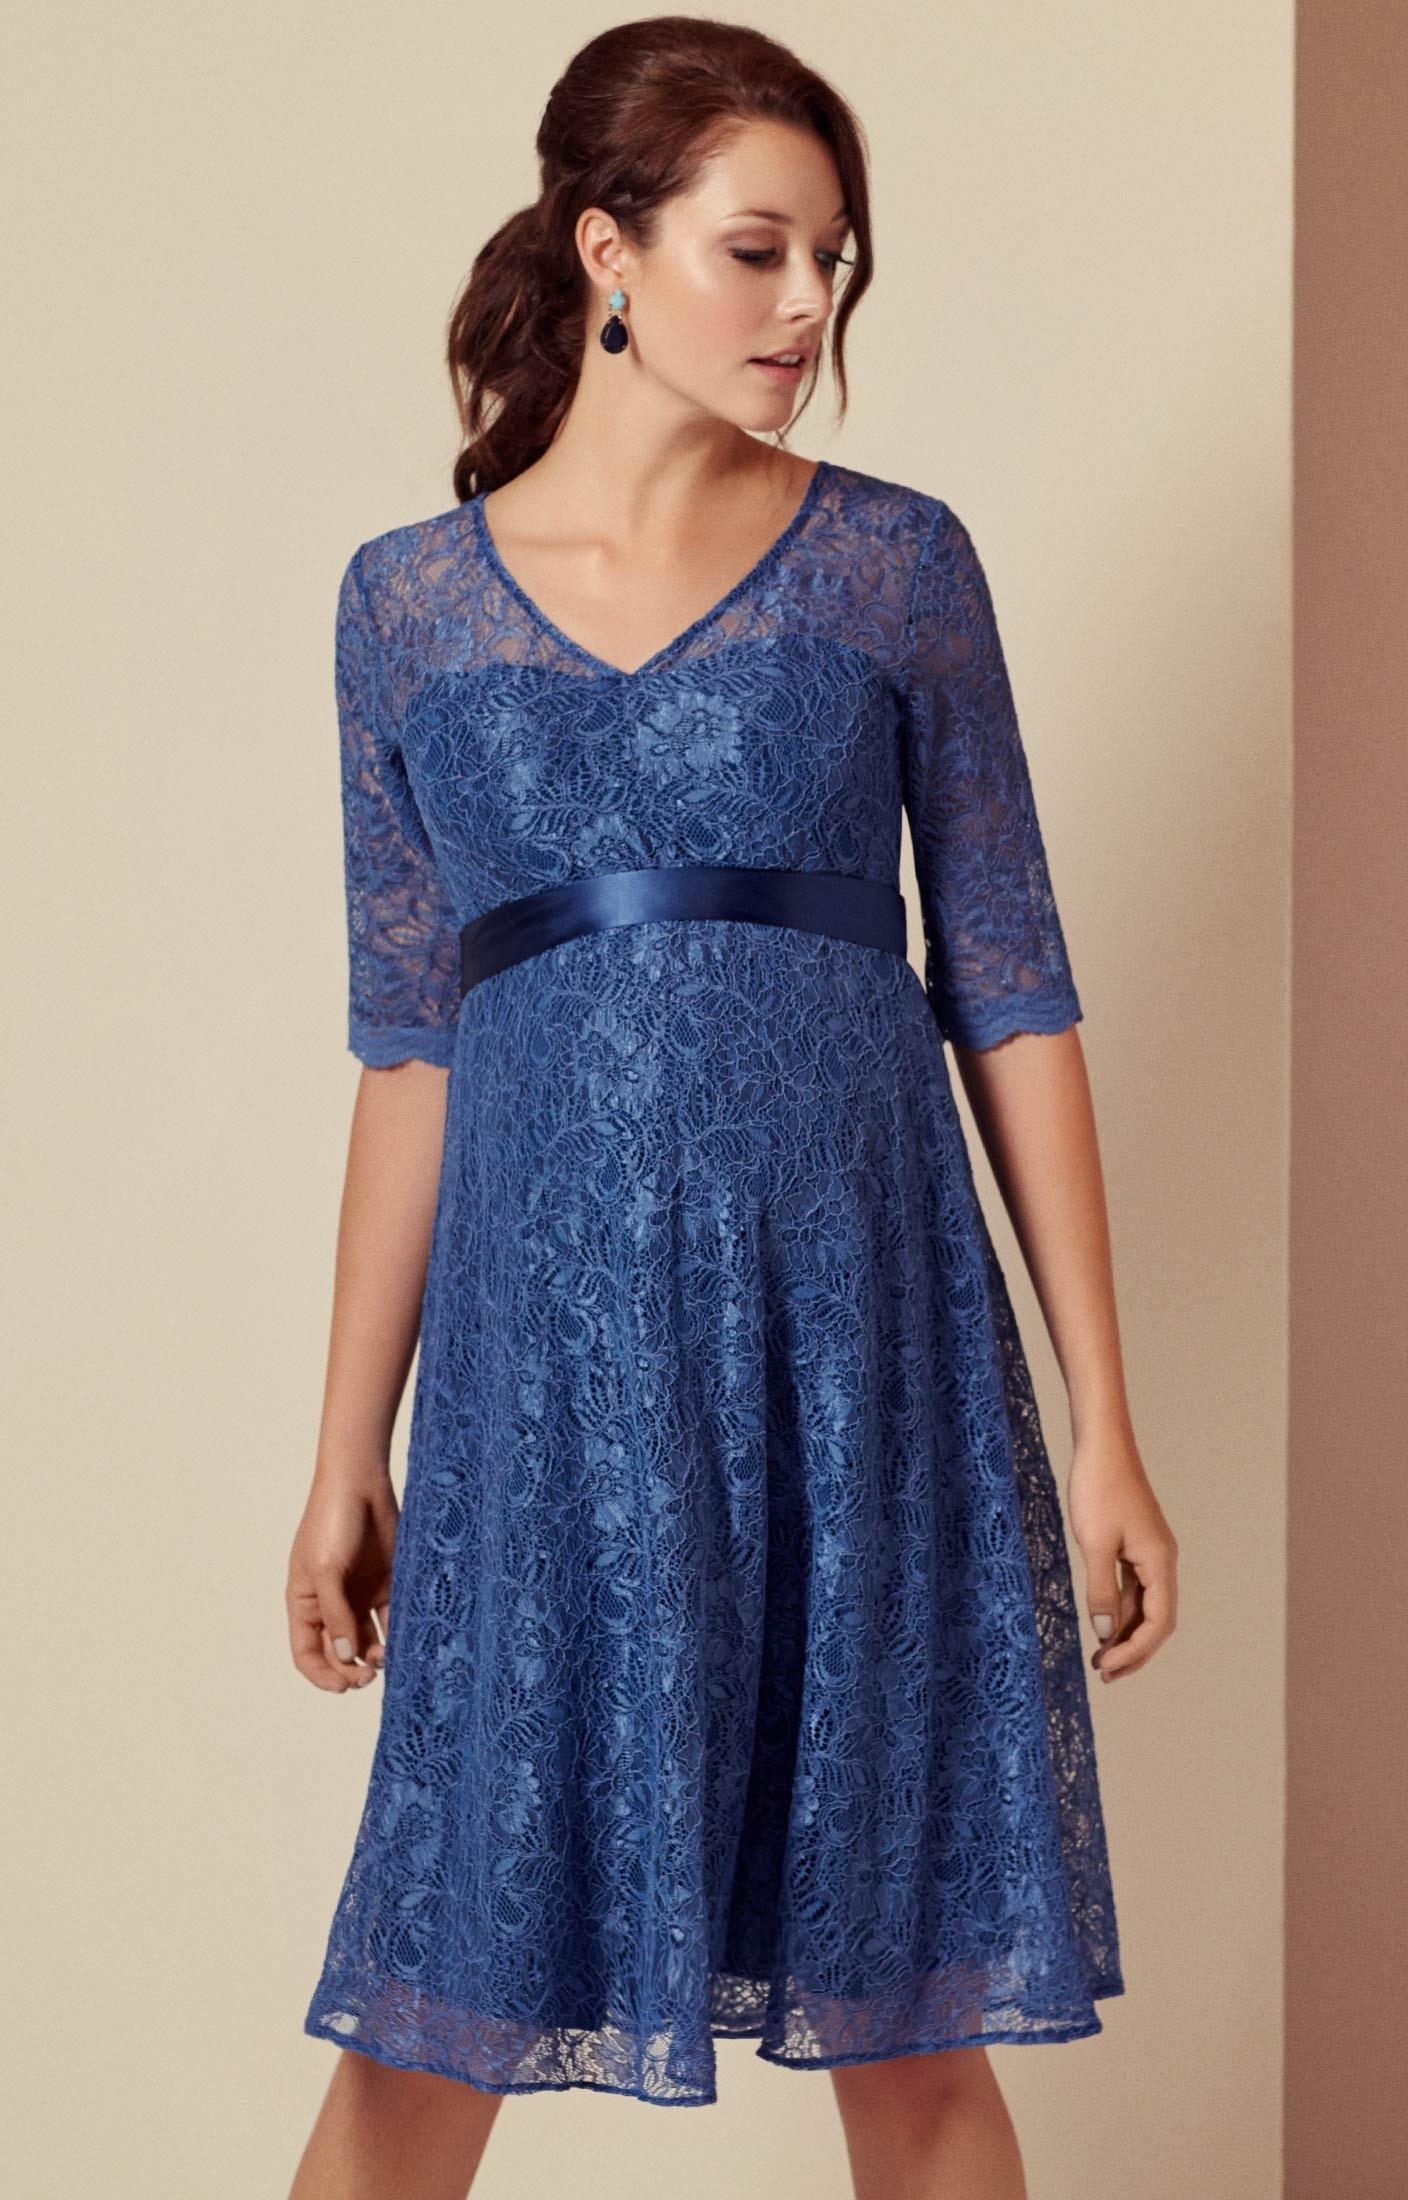 Coolste Kleid Blau Kurz DesignFormal Top Kleid Blau Kurz Stylish